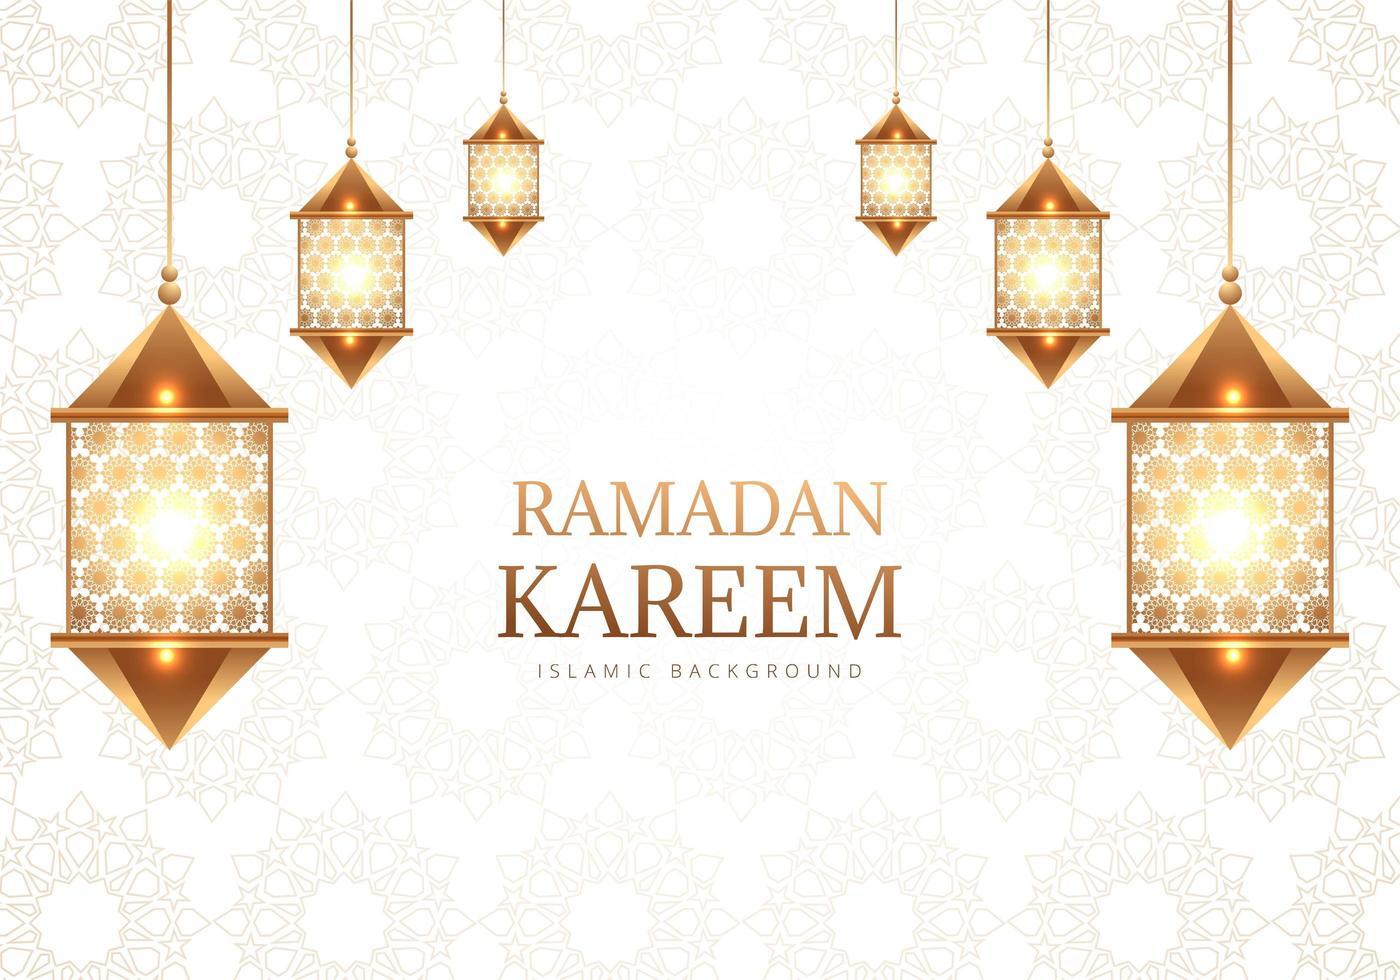 lámparas decorativas árabes ramadan kareem en patrón blanco vector